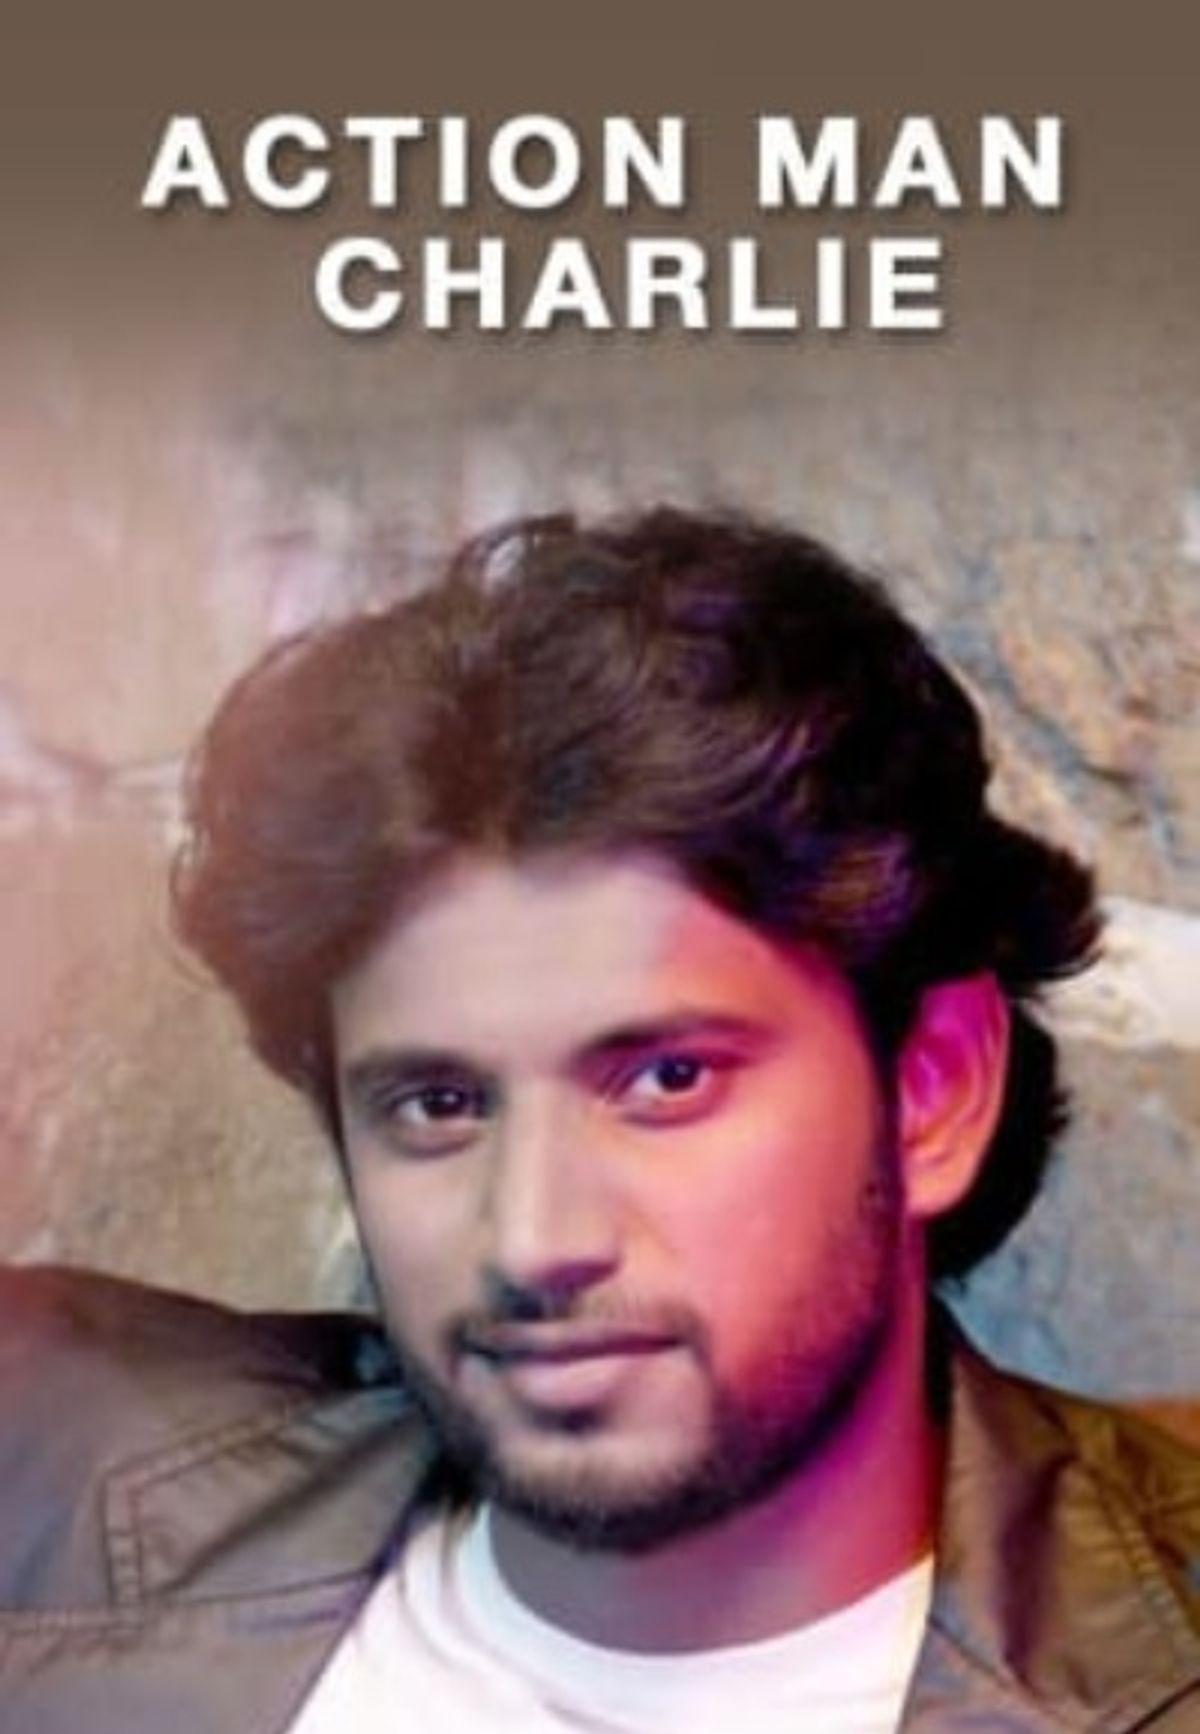 Action Man Charlie